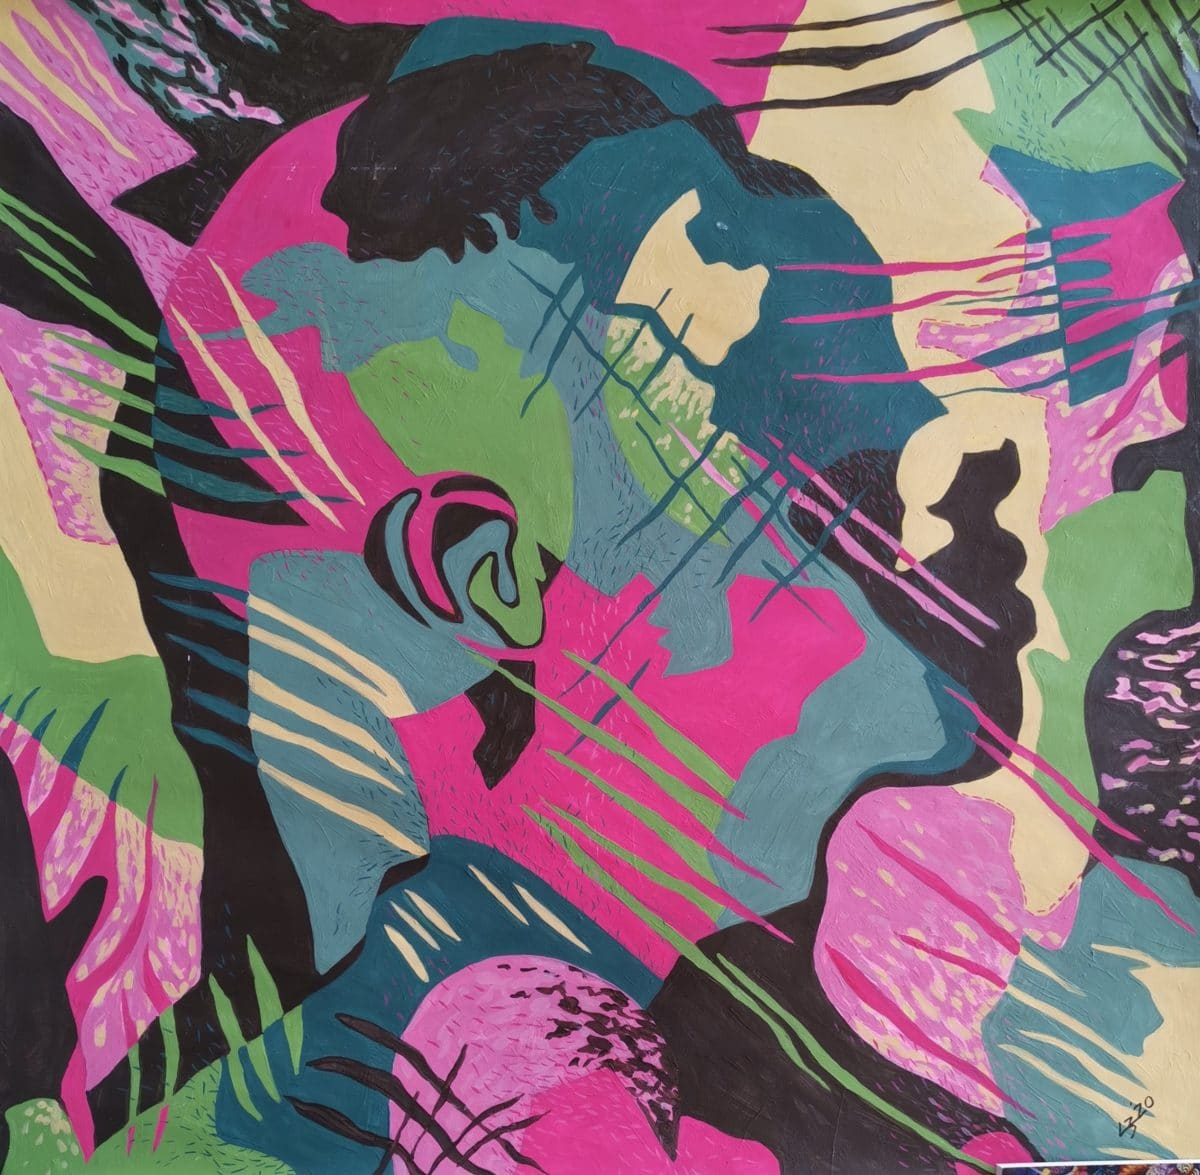 Lee Scott Hempson - Urban Jungle - 2020